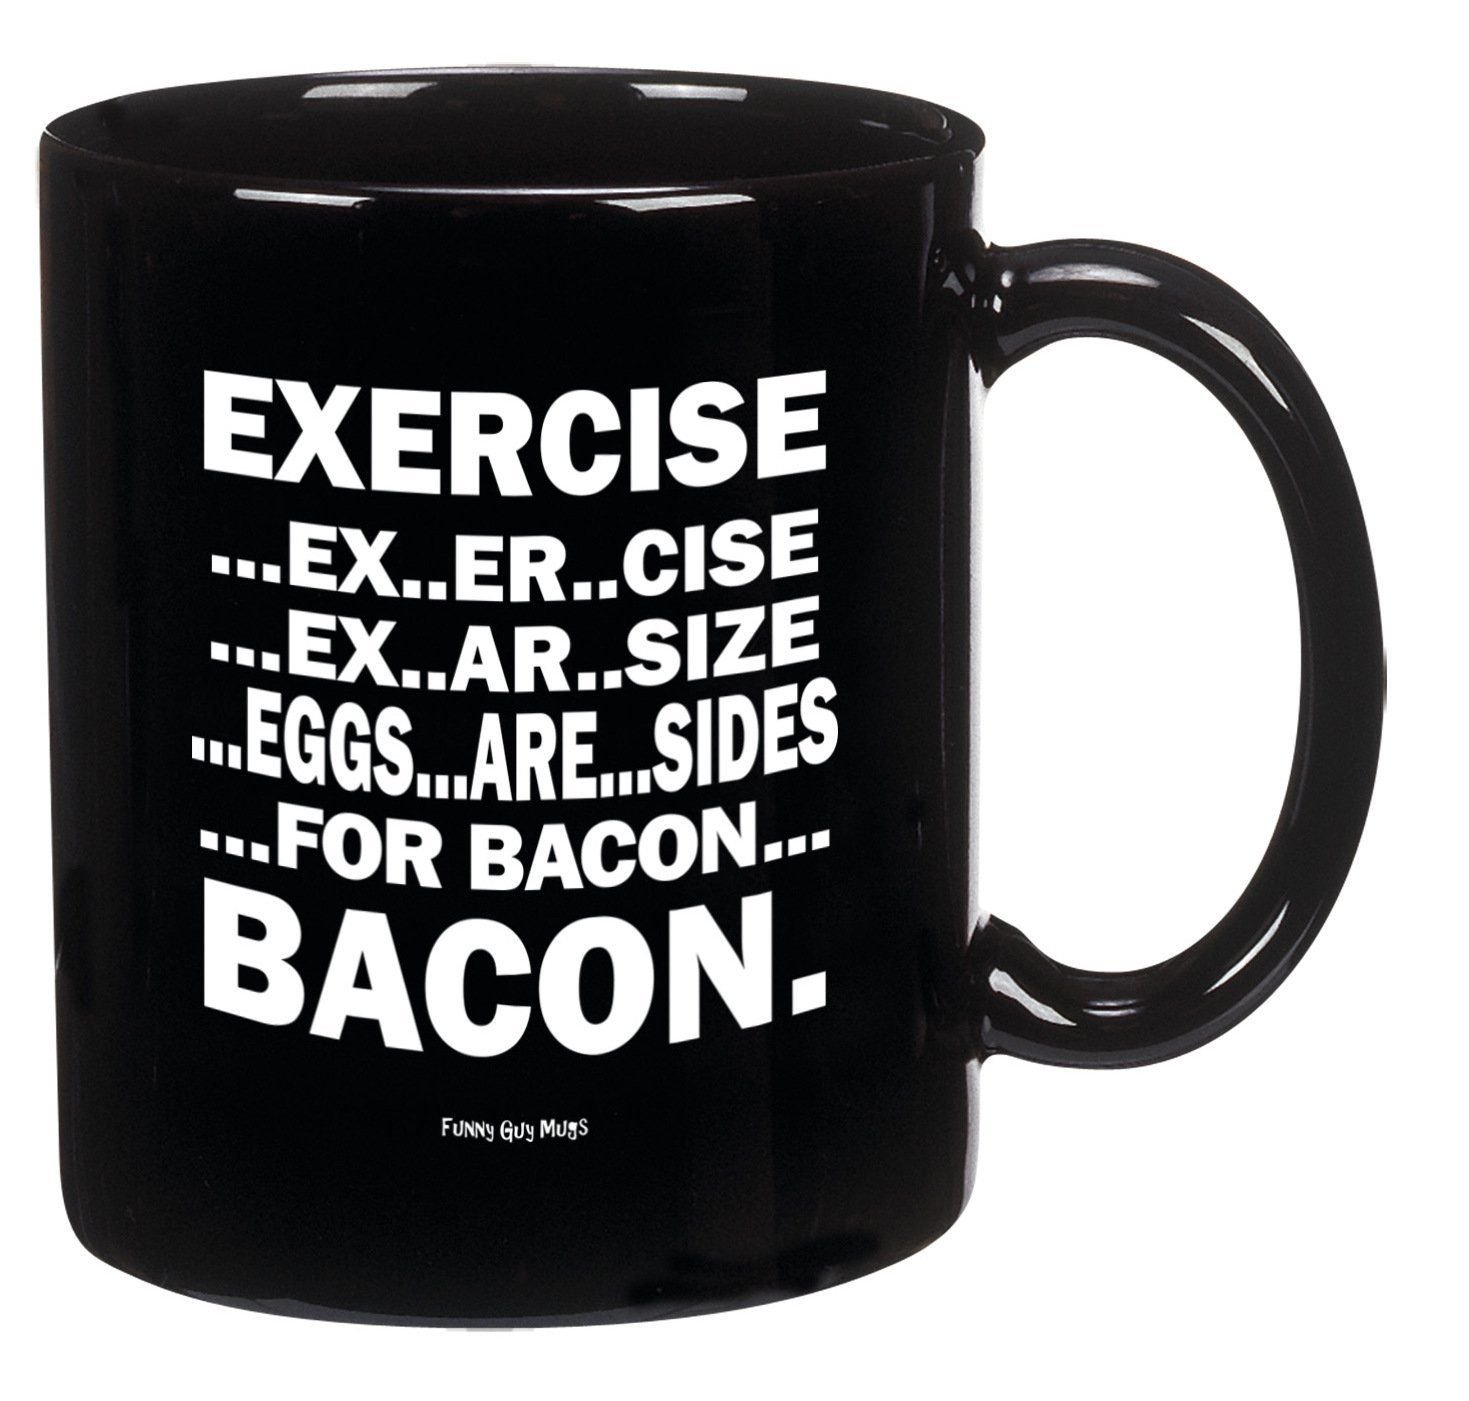 Funny Guy Mugs Eggs Are Sides For Bacon Ceramic Coffee Mug ...